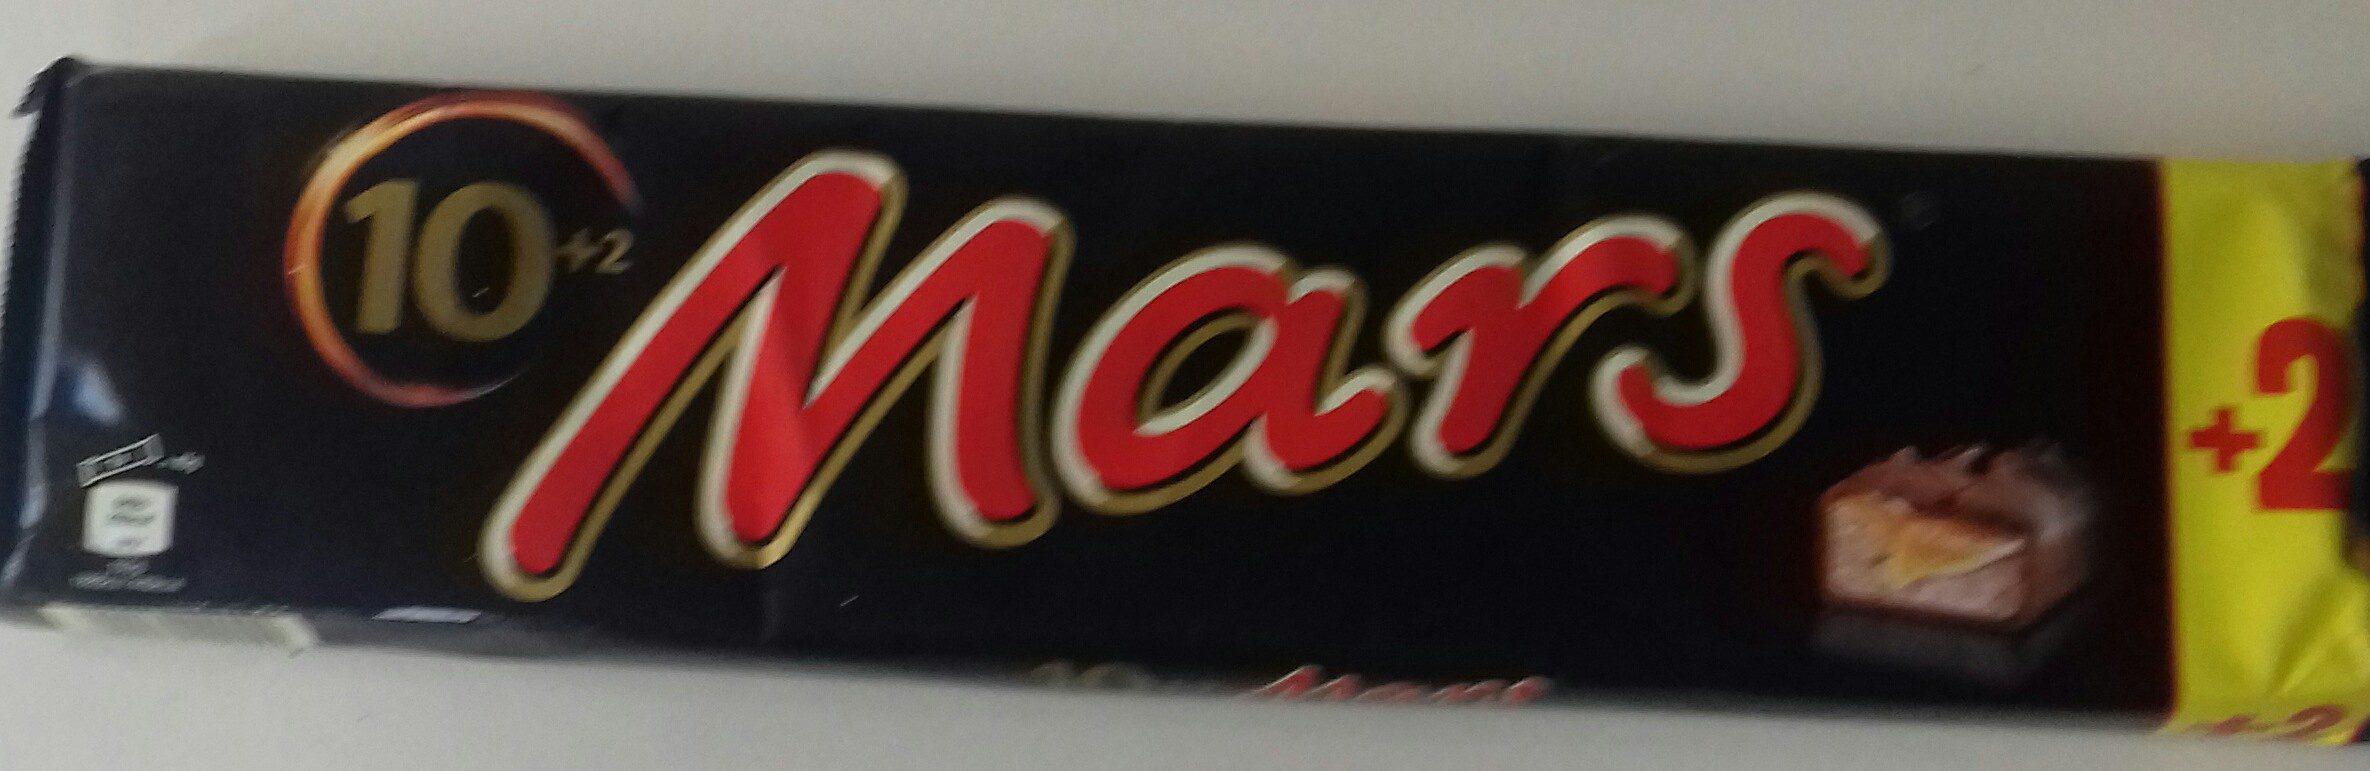 Mars 10+2 Riegel 540G - Product